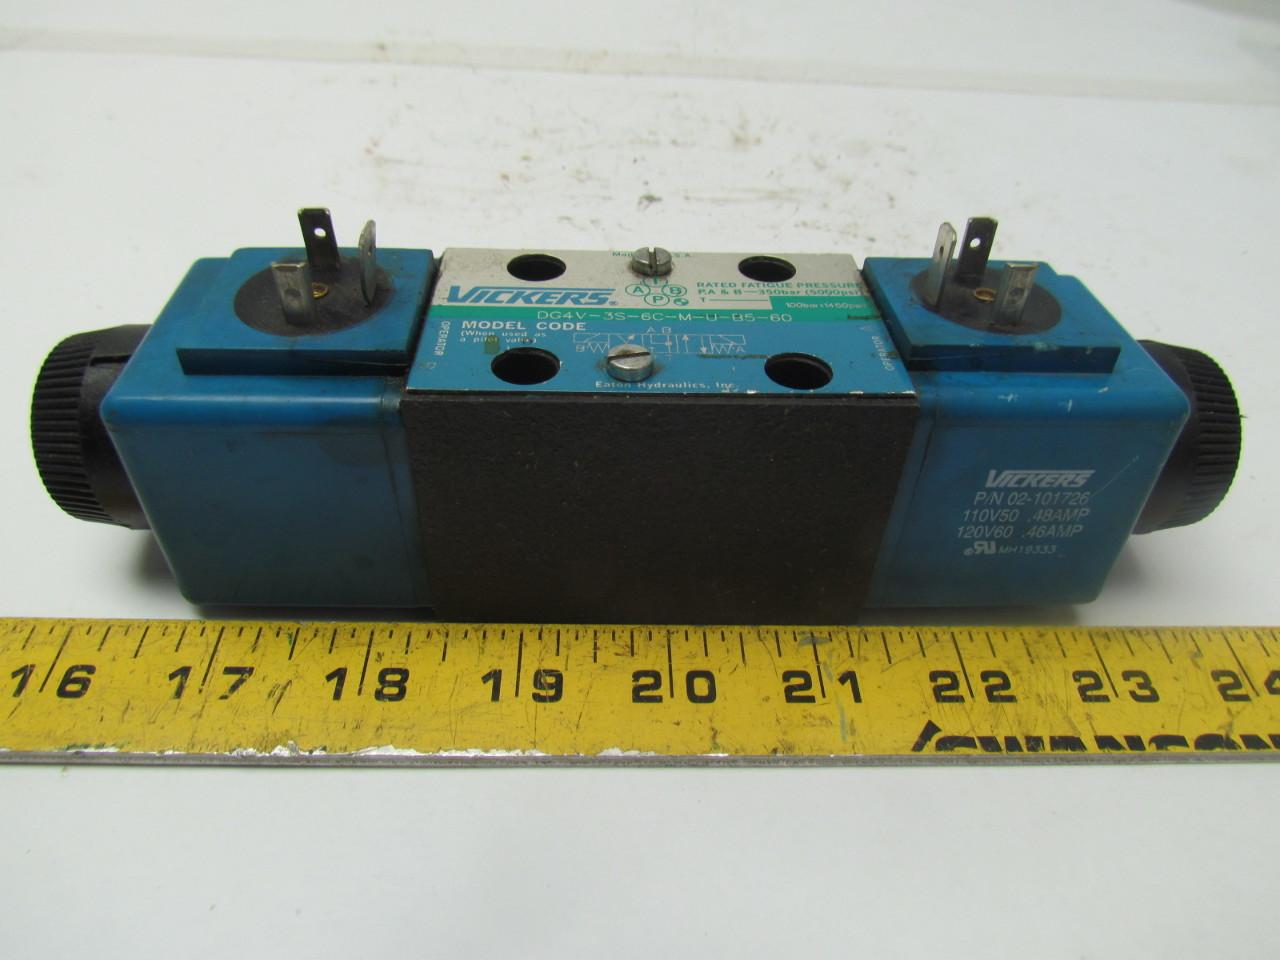 Vicker DG4V-3S-6C-M-U-B5--60 120V Reversible Hydraulic Directional Control Valve